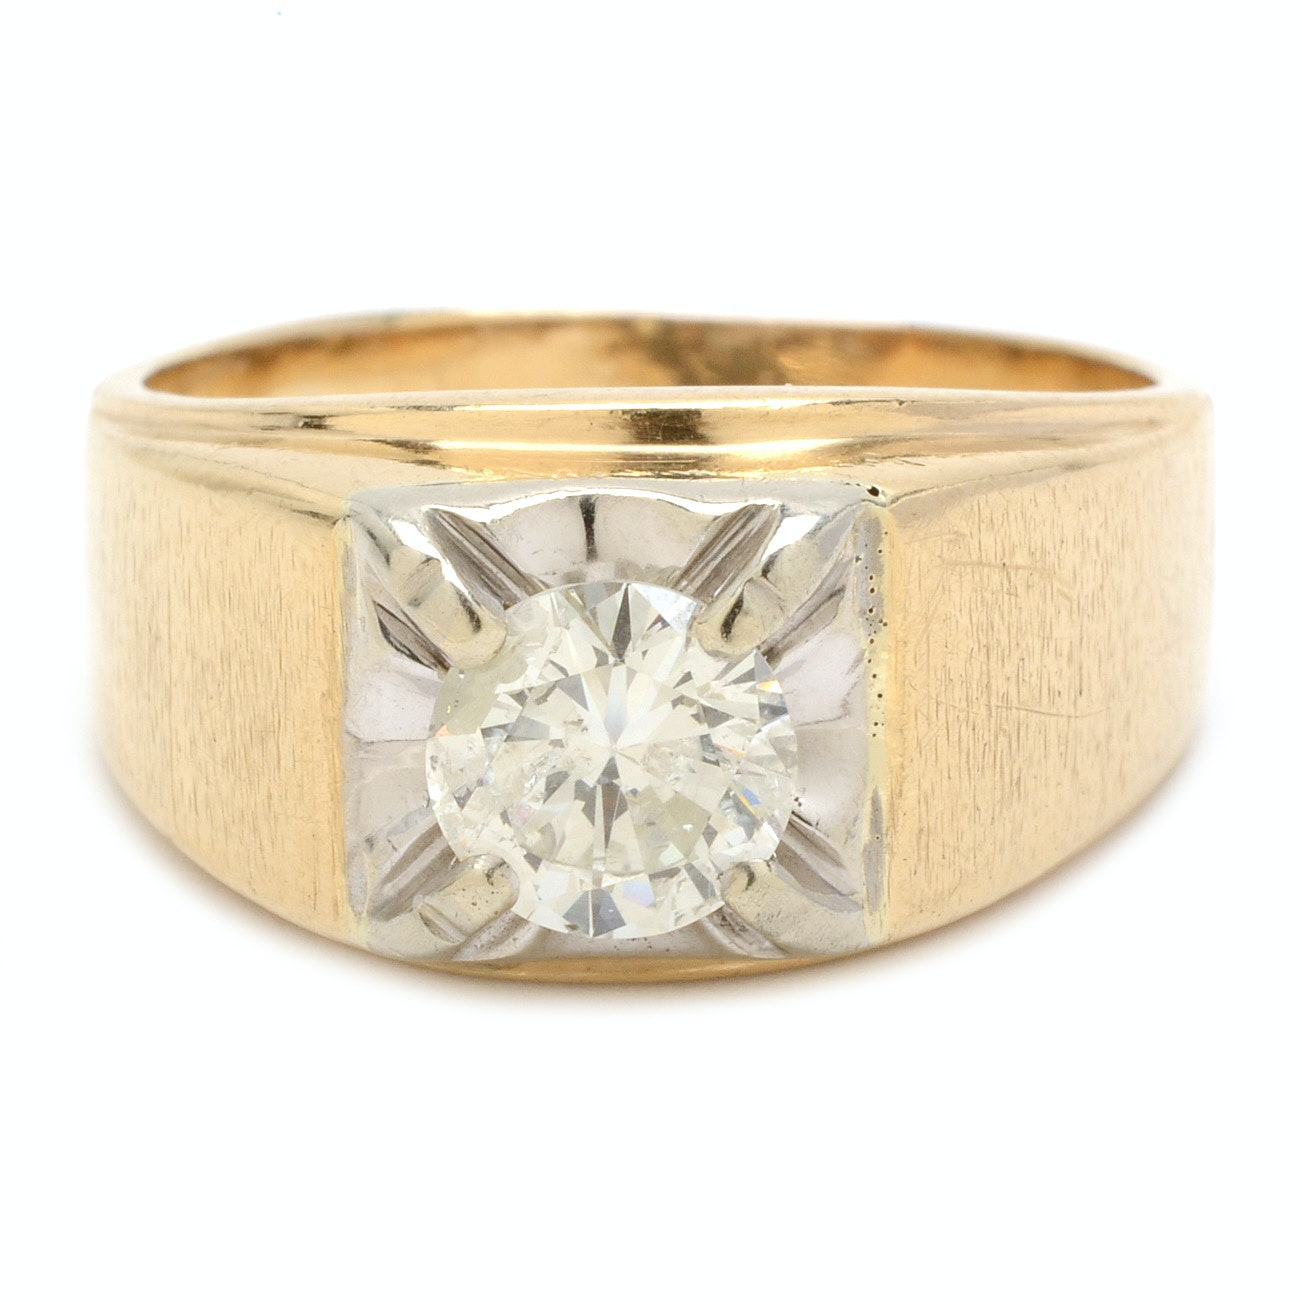 10K Yellow Gold 1.09 Carat Diamond Ring